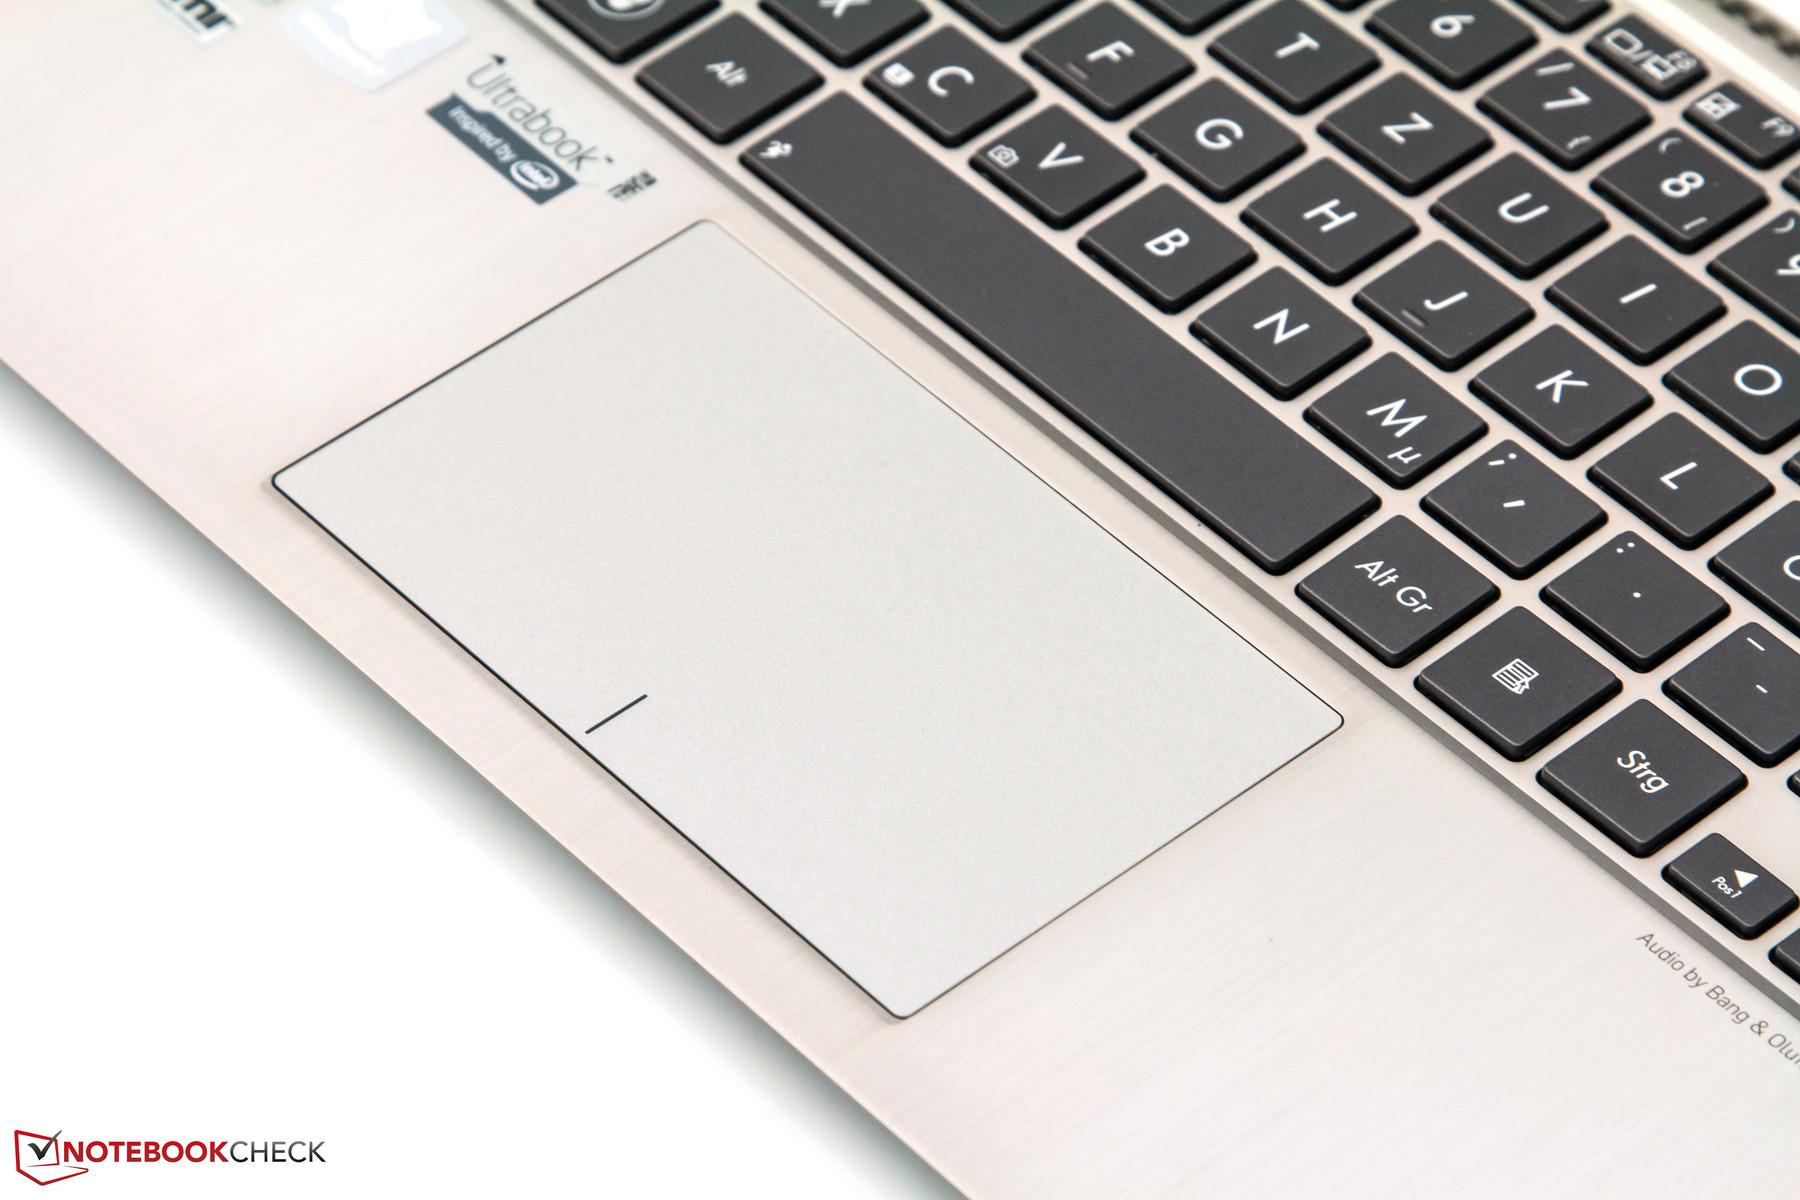 Drivers: Asus Zenbook Prime UX21A MyBitCast